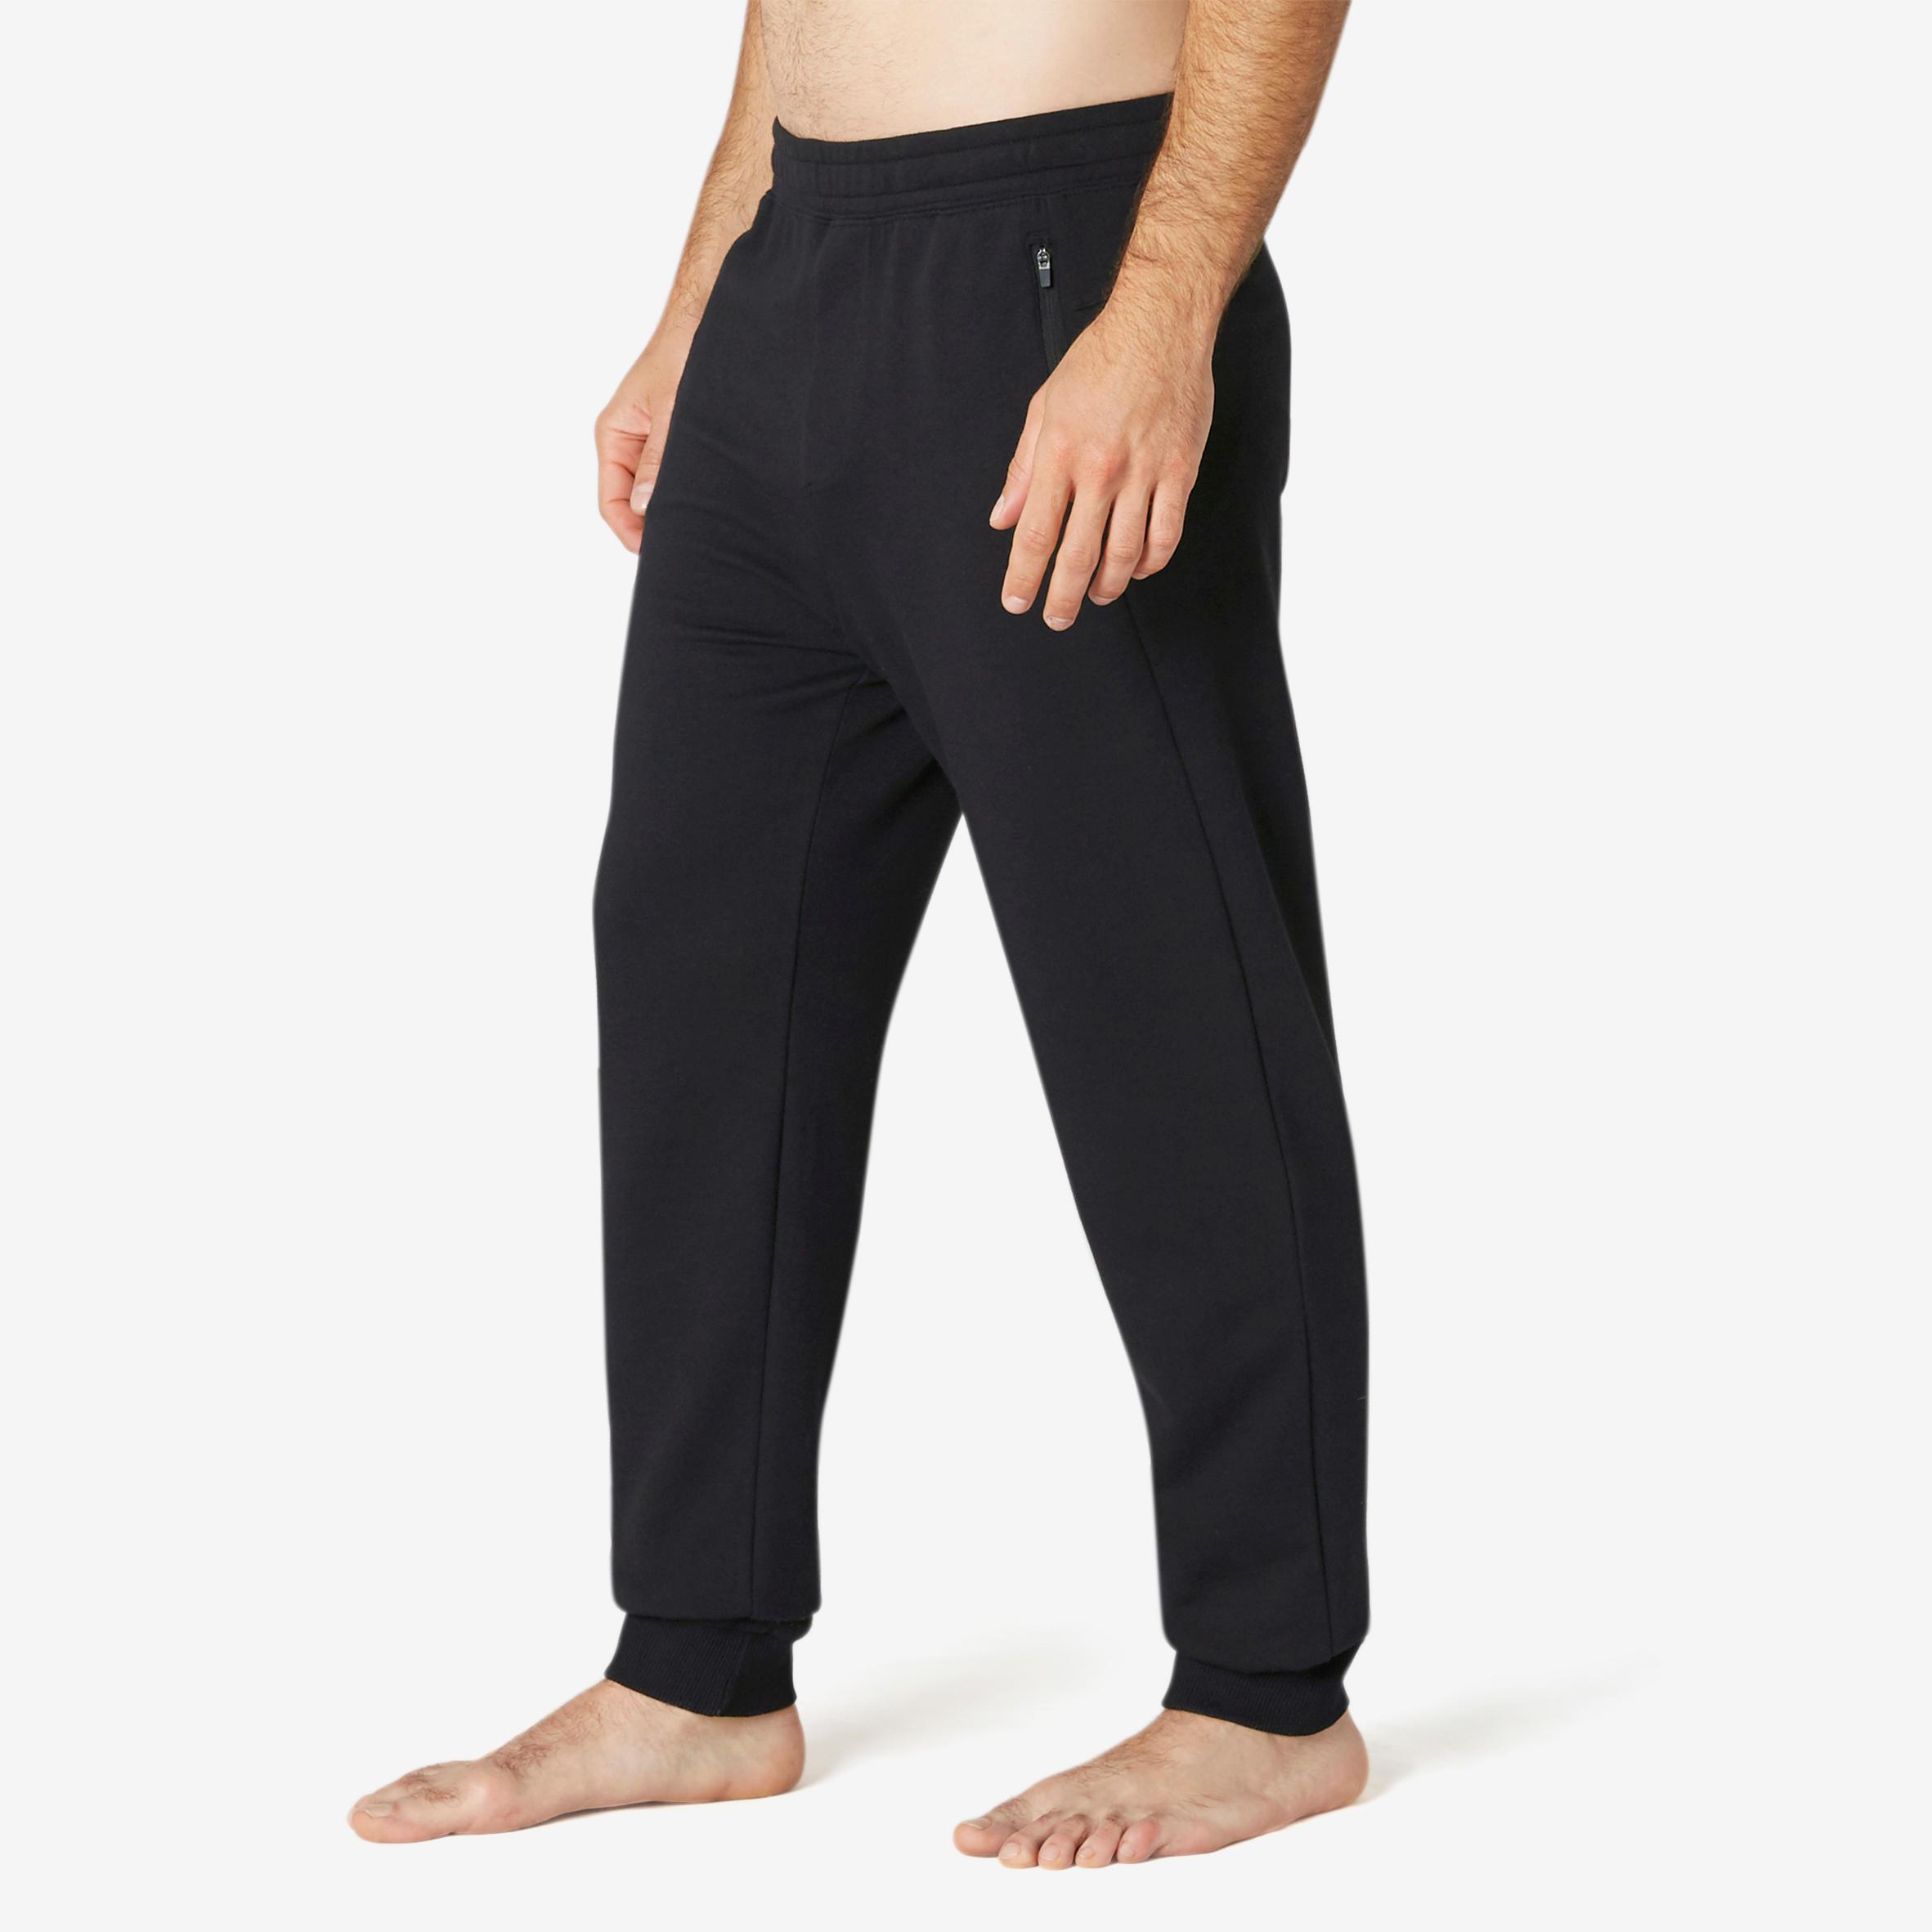 Pantalon Regular 500 bărbați la Reducere poza